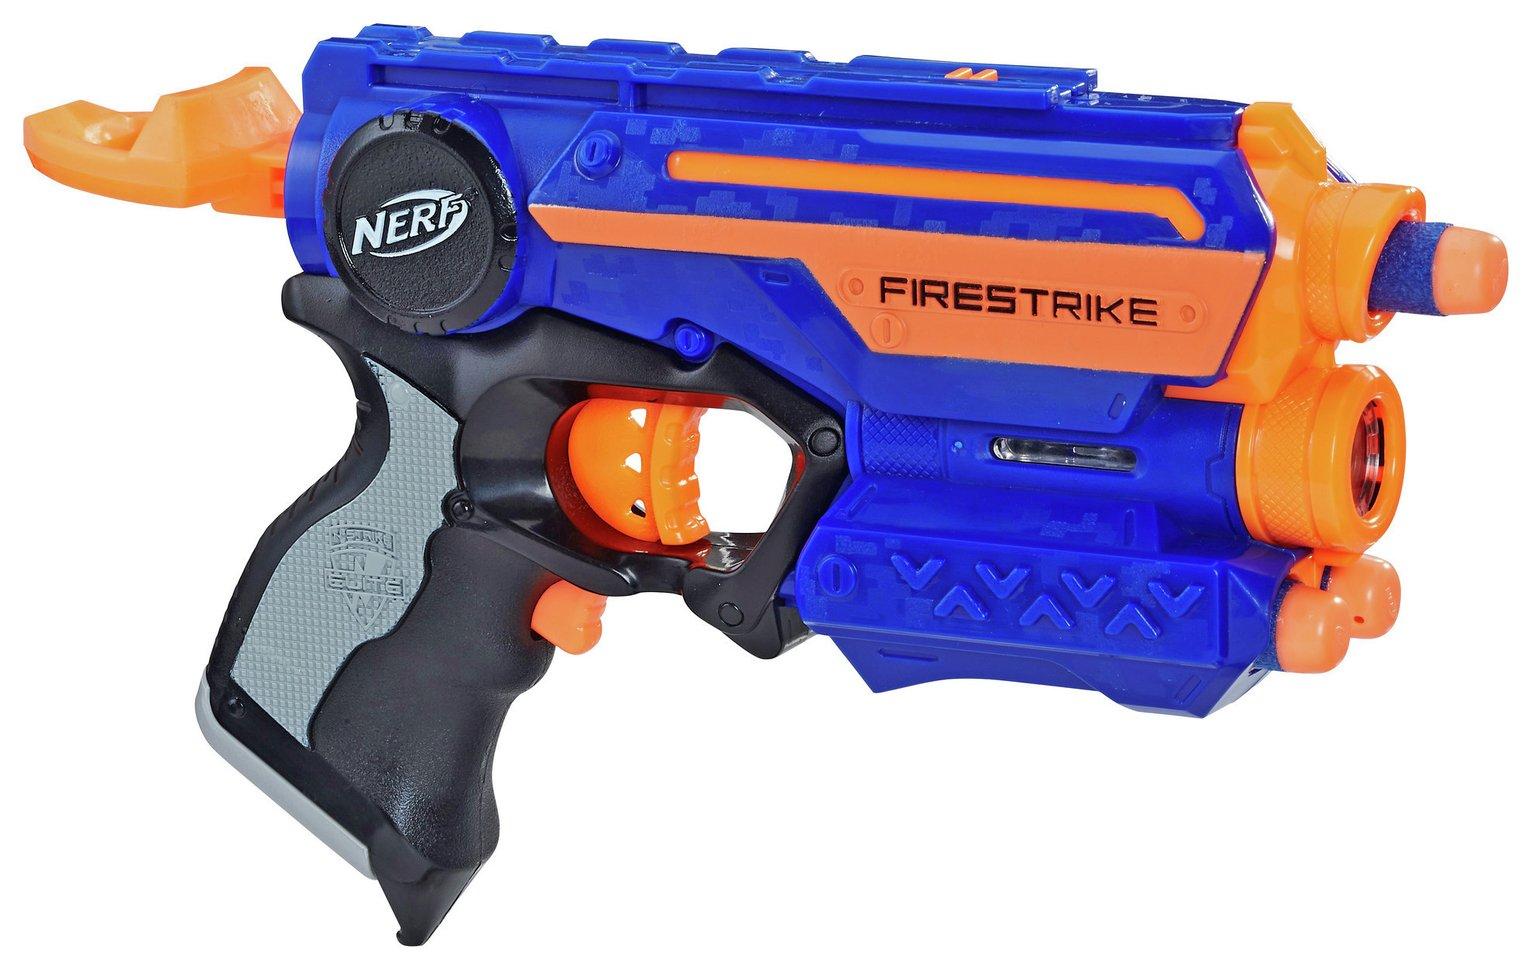 Nerf N-Strike Firestrike Blaster £5 + £3.95 del @ Argos